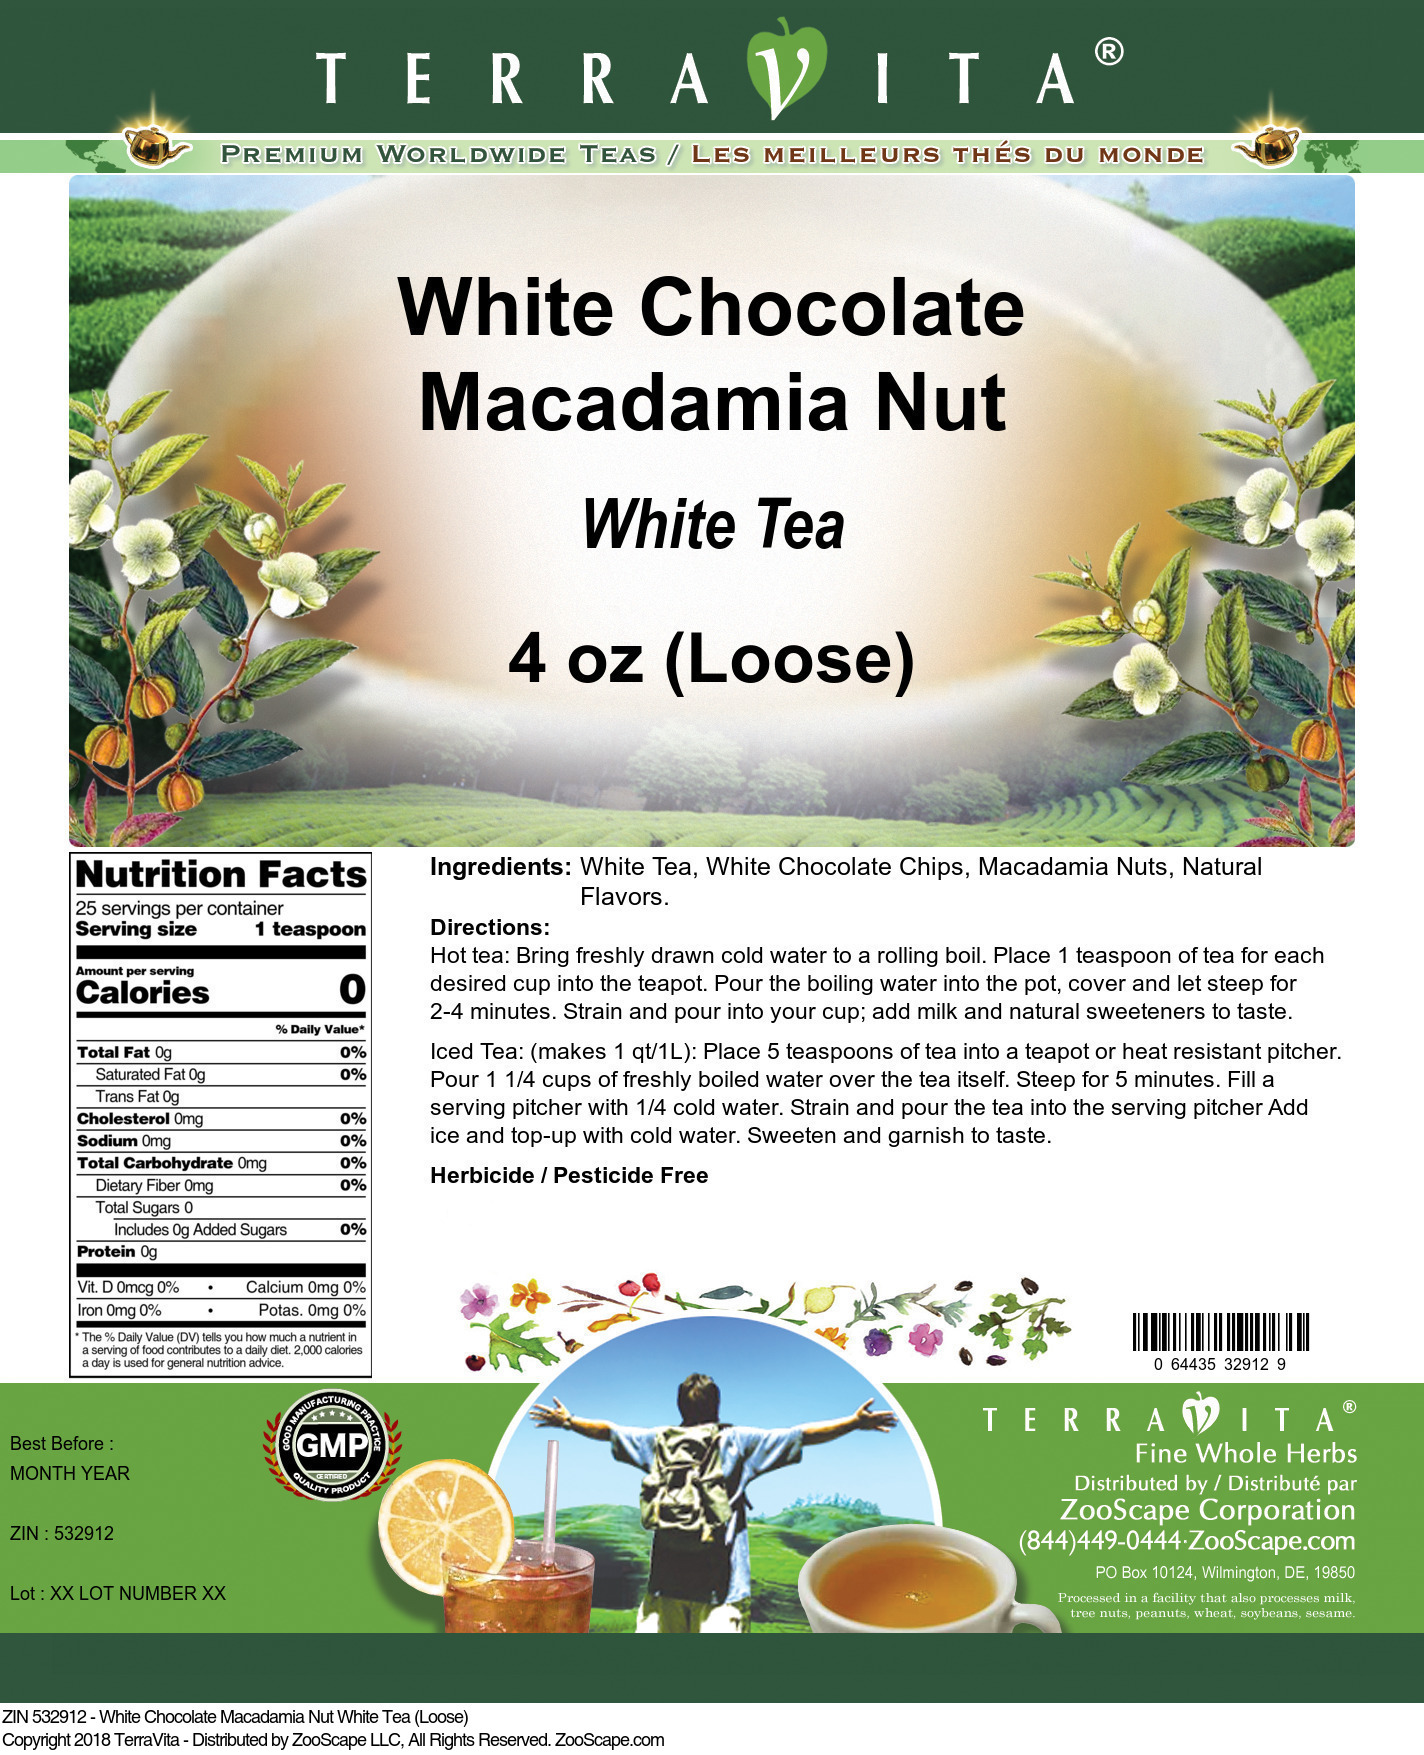 White Chocolate Macadamia Nut White Tea (Loose)